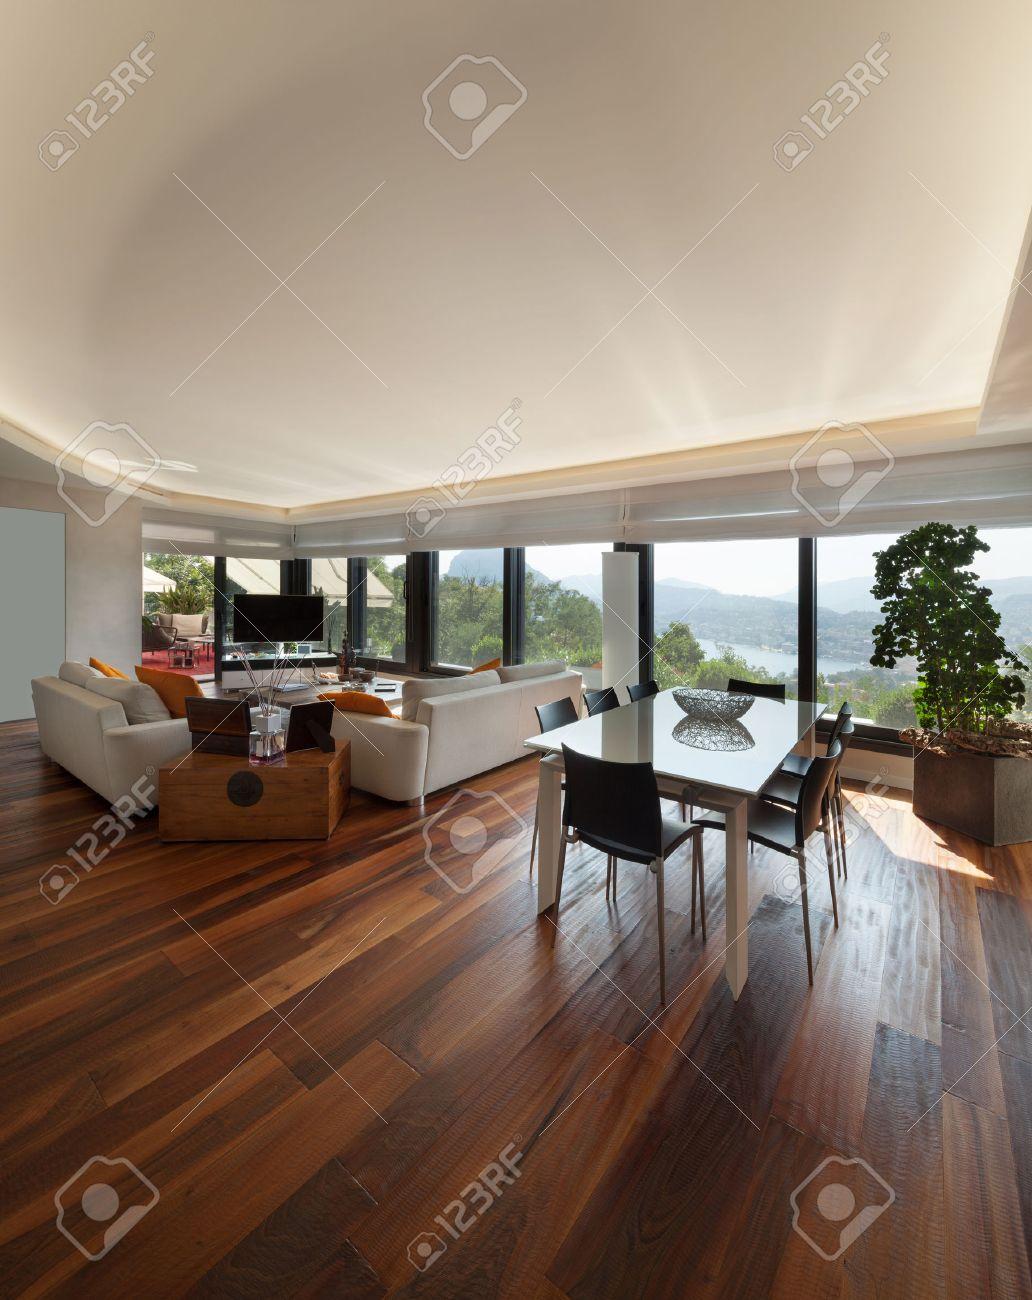 Interiors, wide modern living room of a luxury apartment Standard-Bild - 47441615